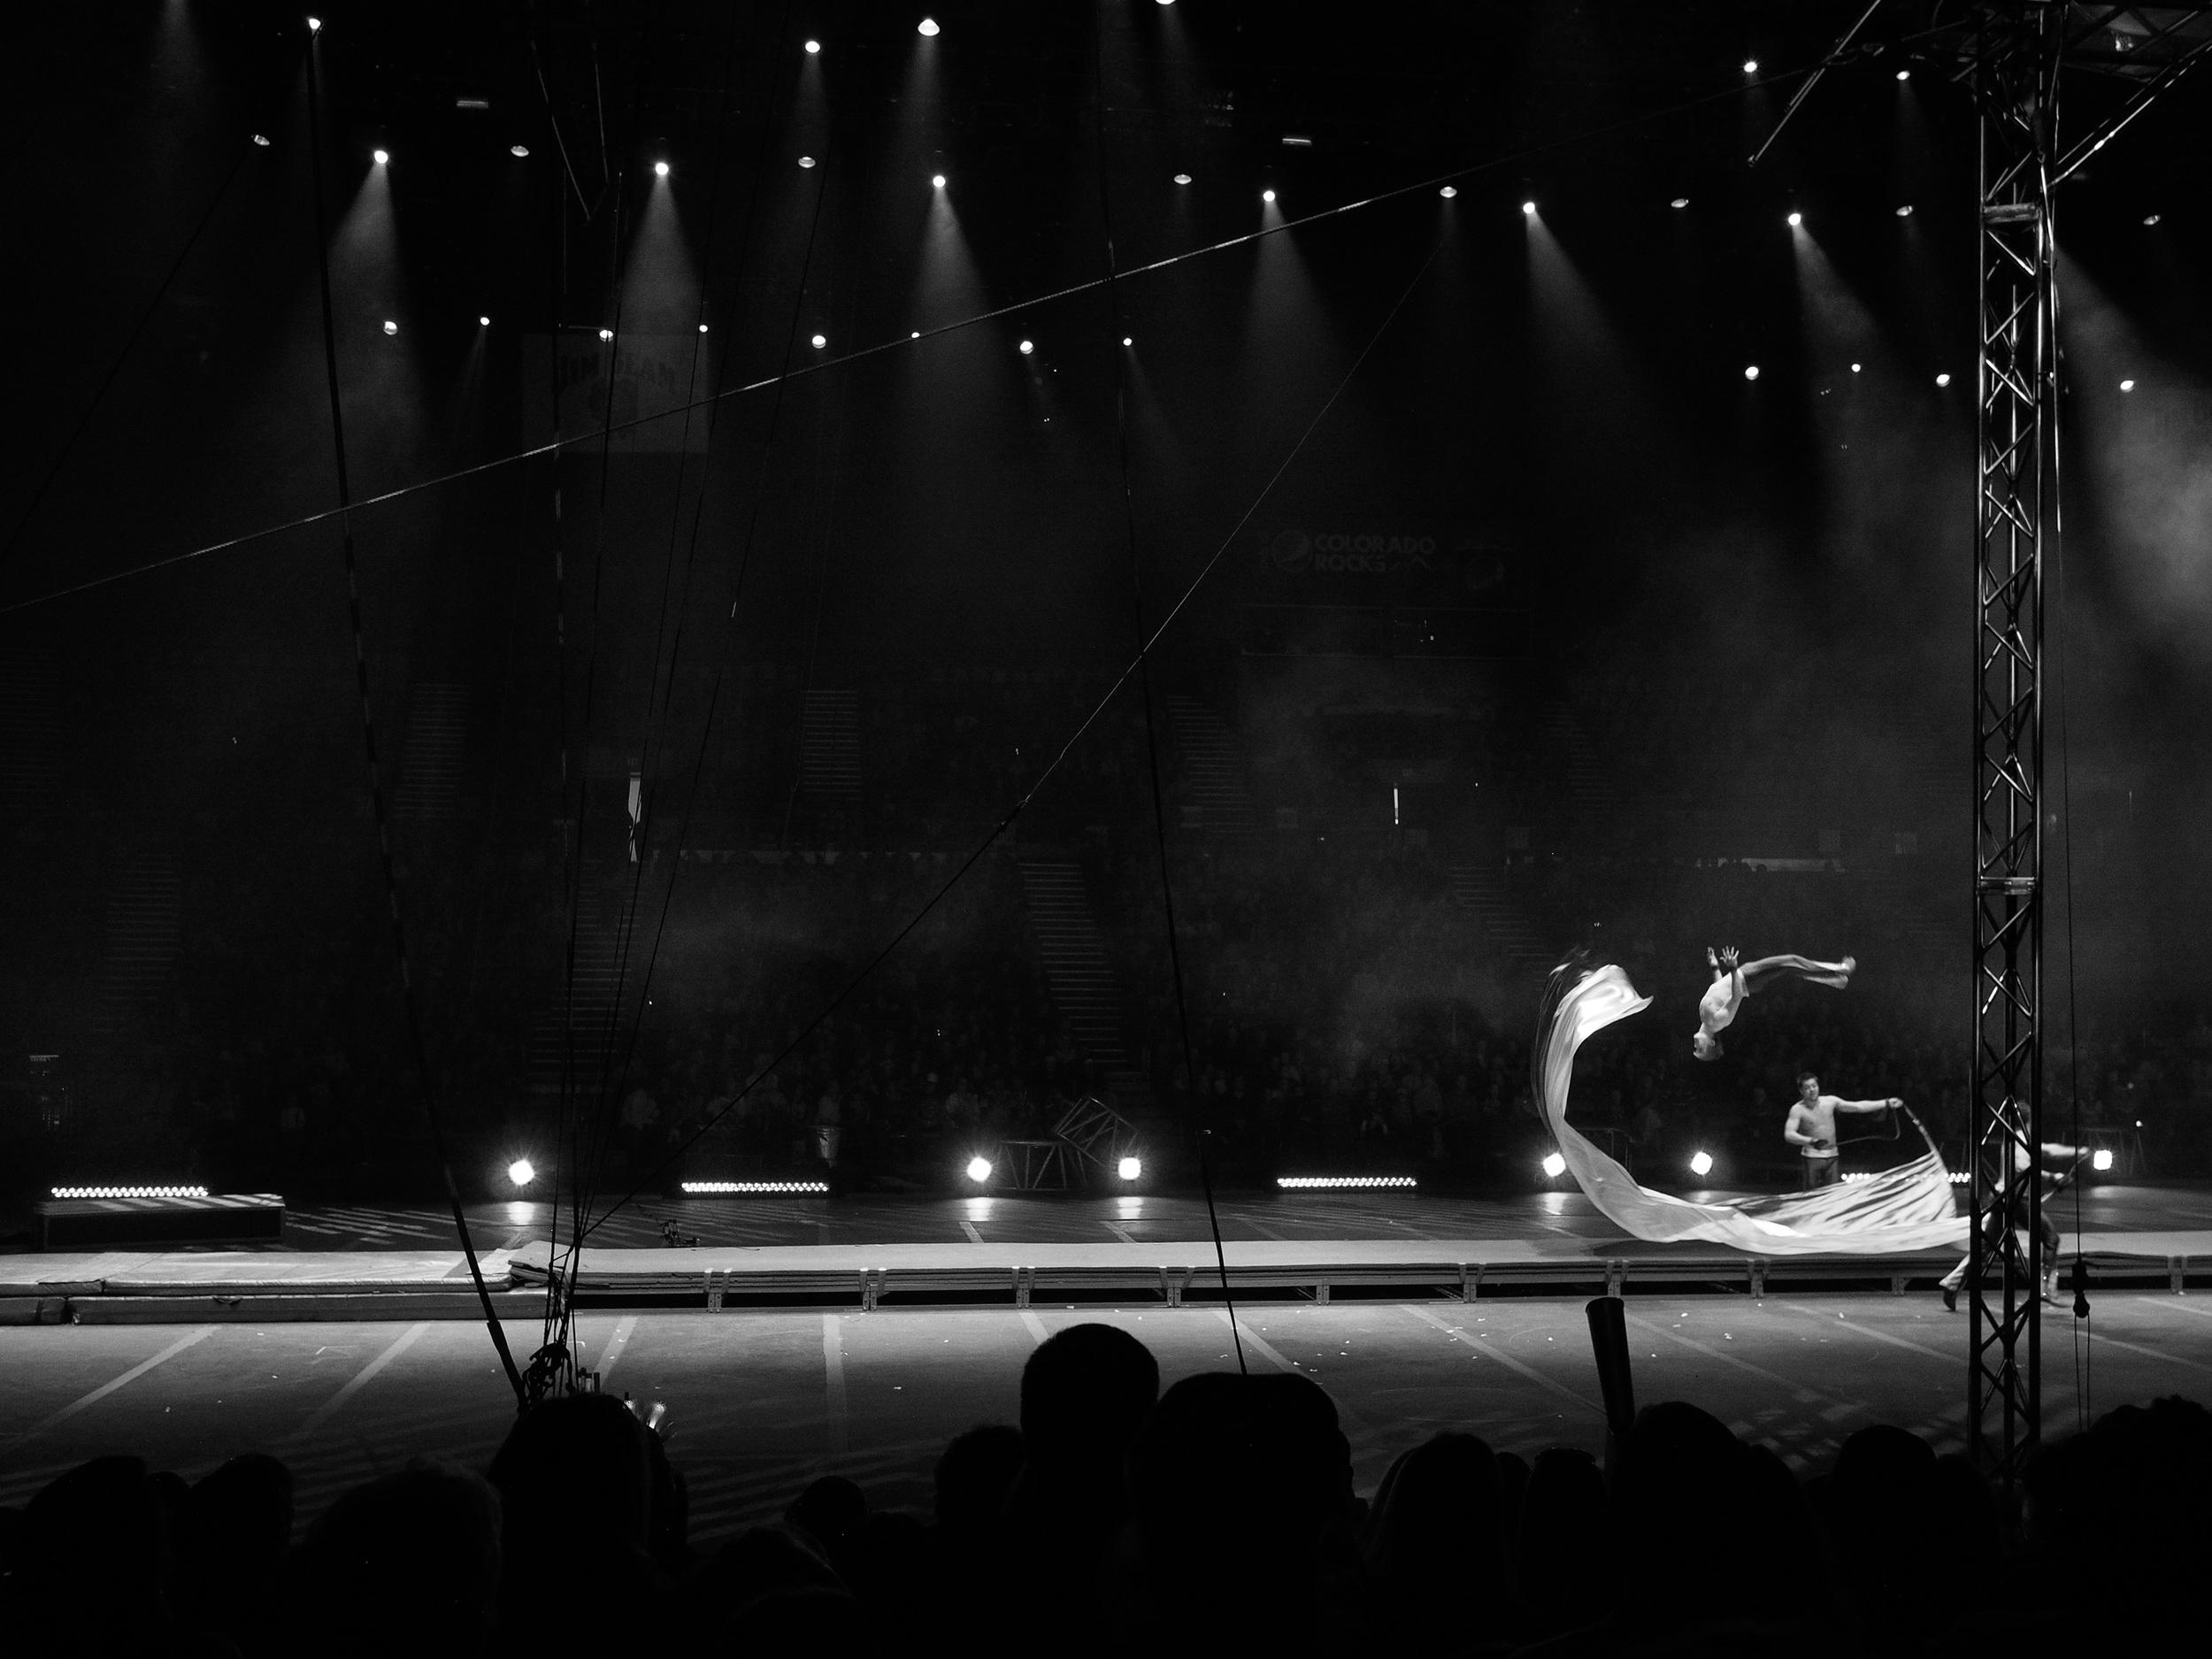 20131005-circus_11554_.jpg